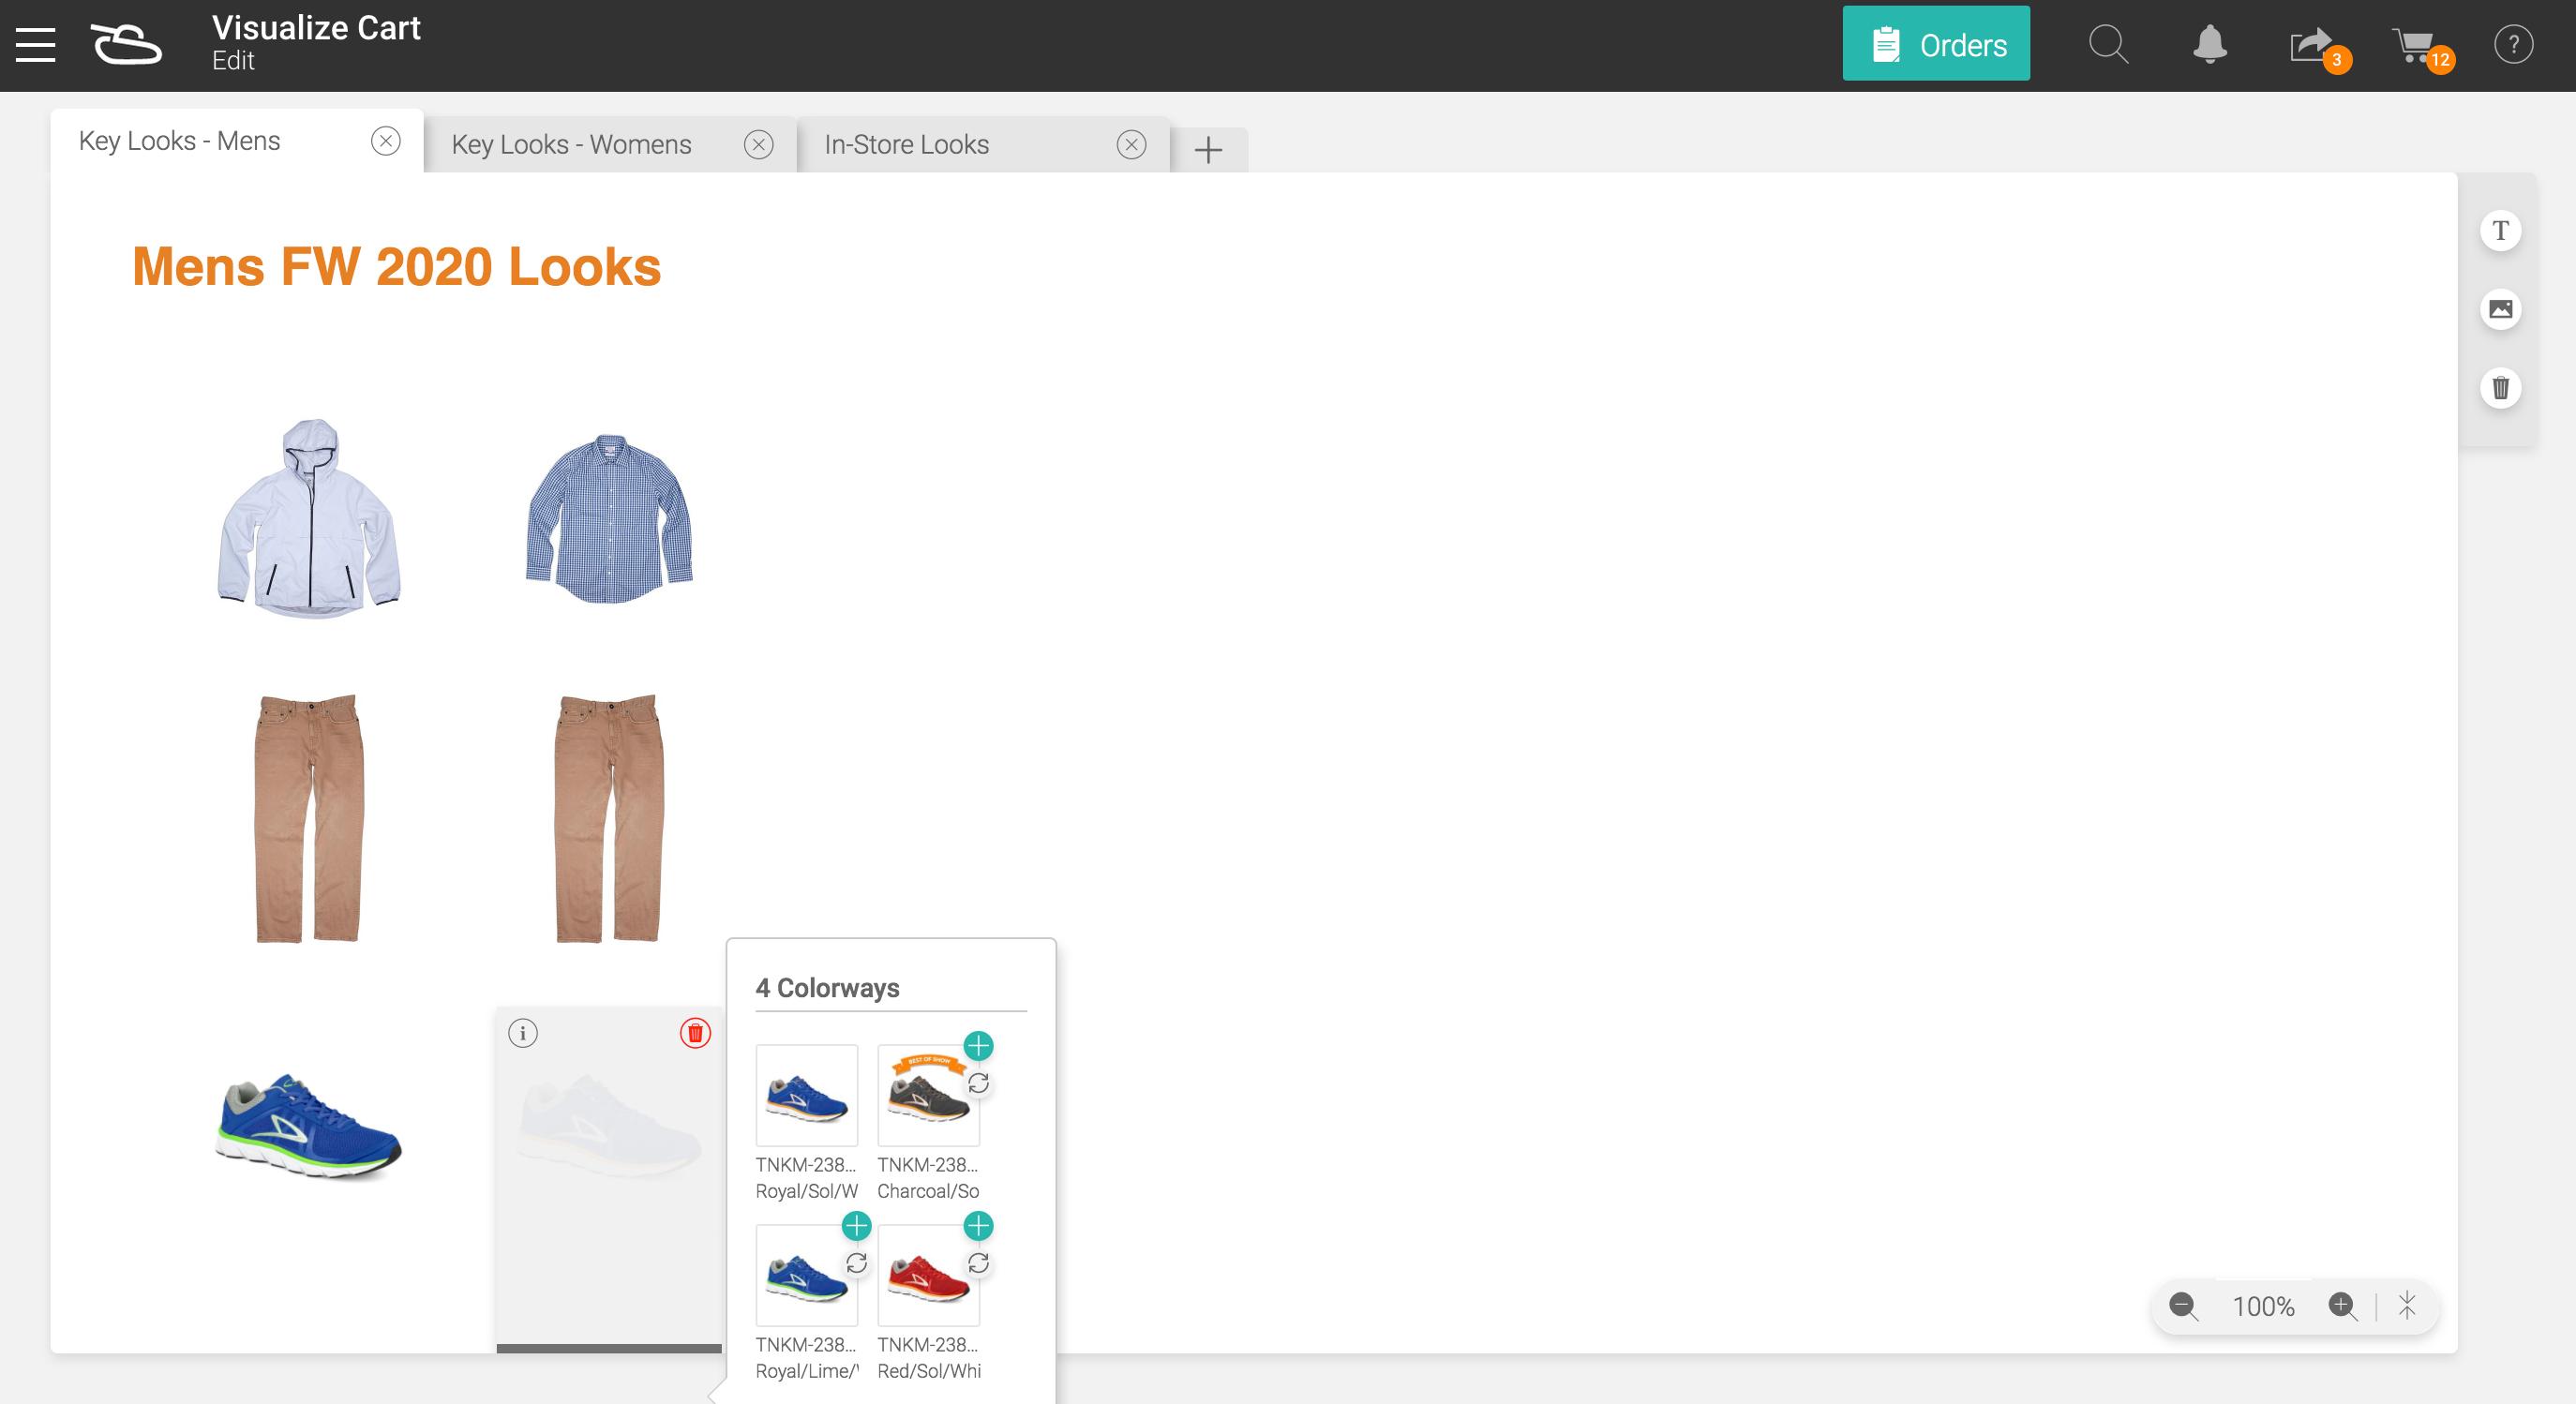 Visually Merchandise Orders